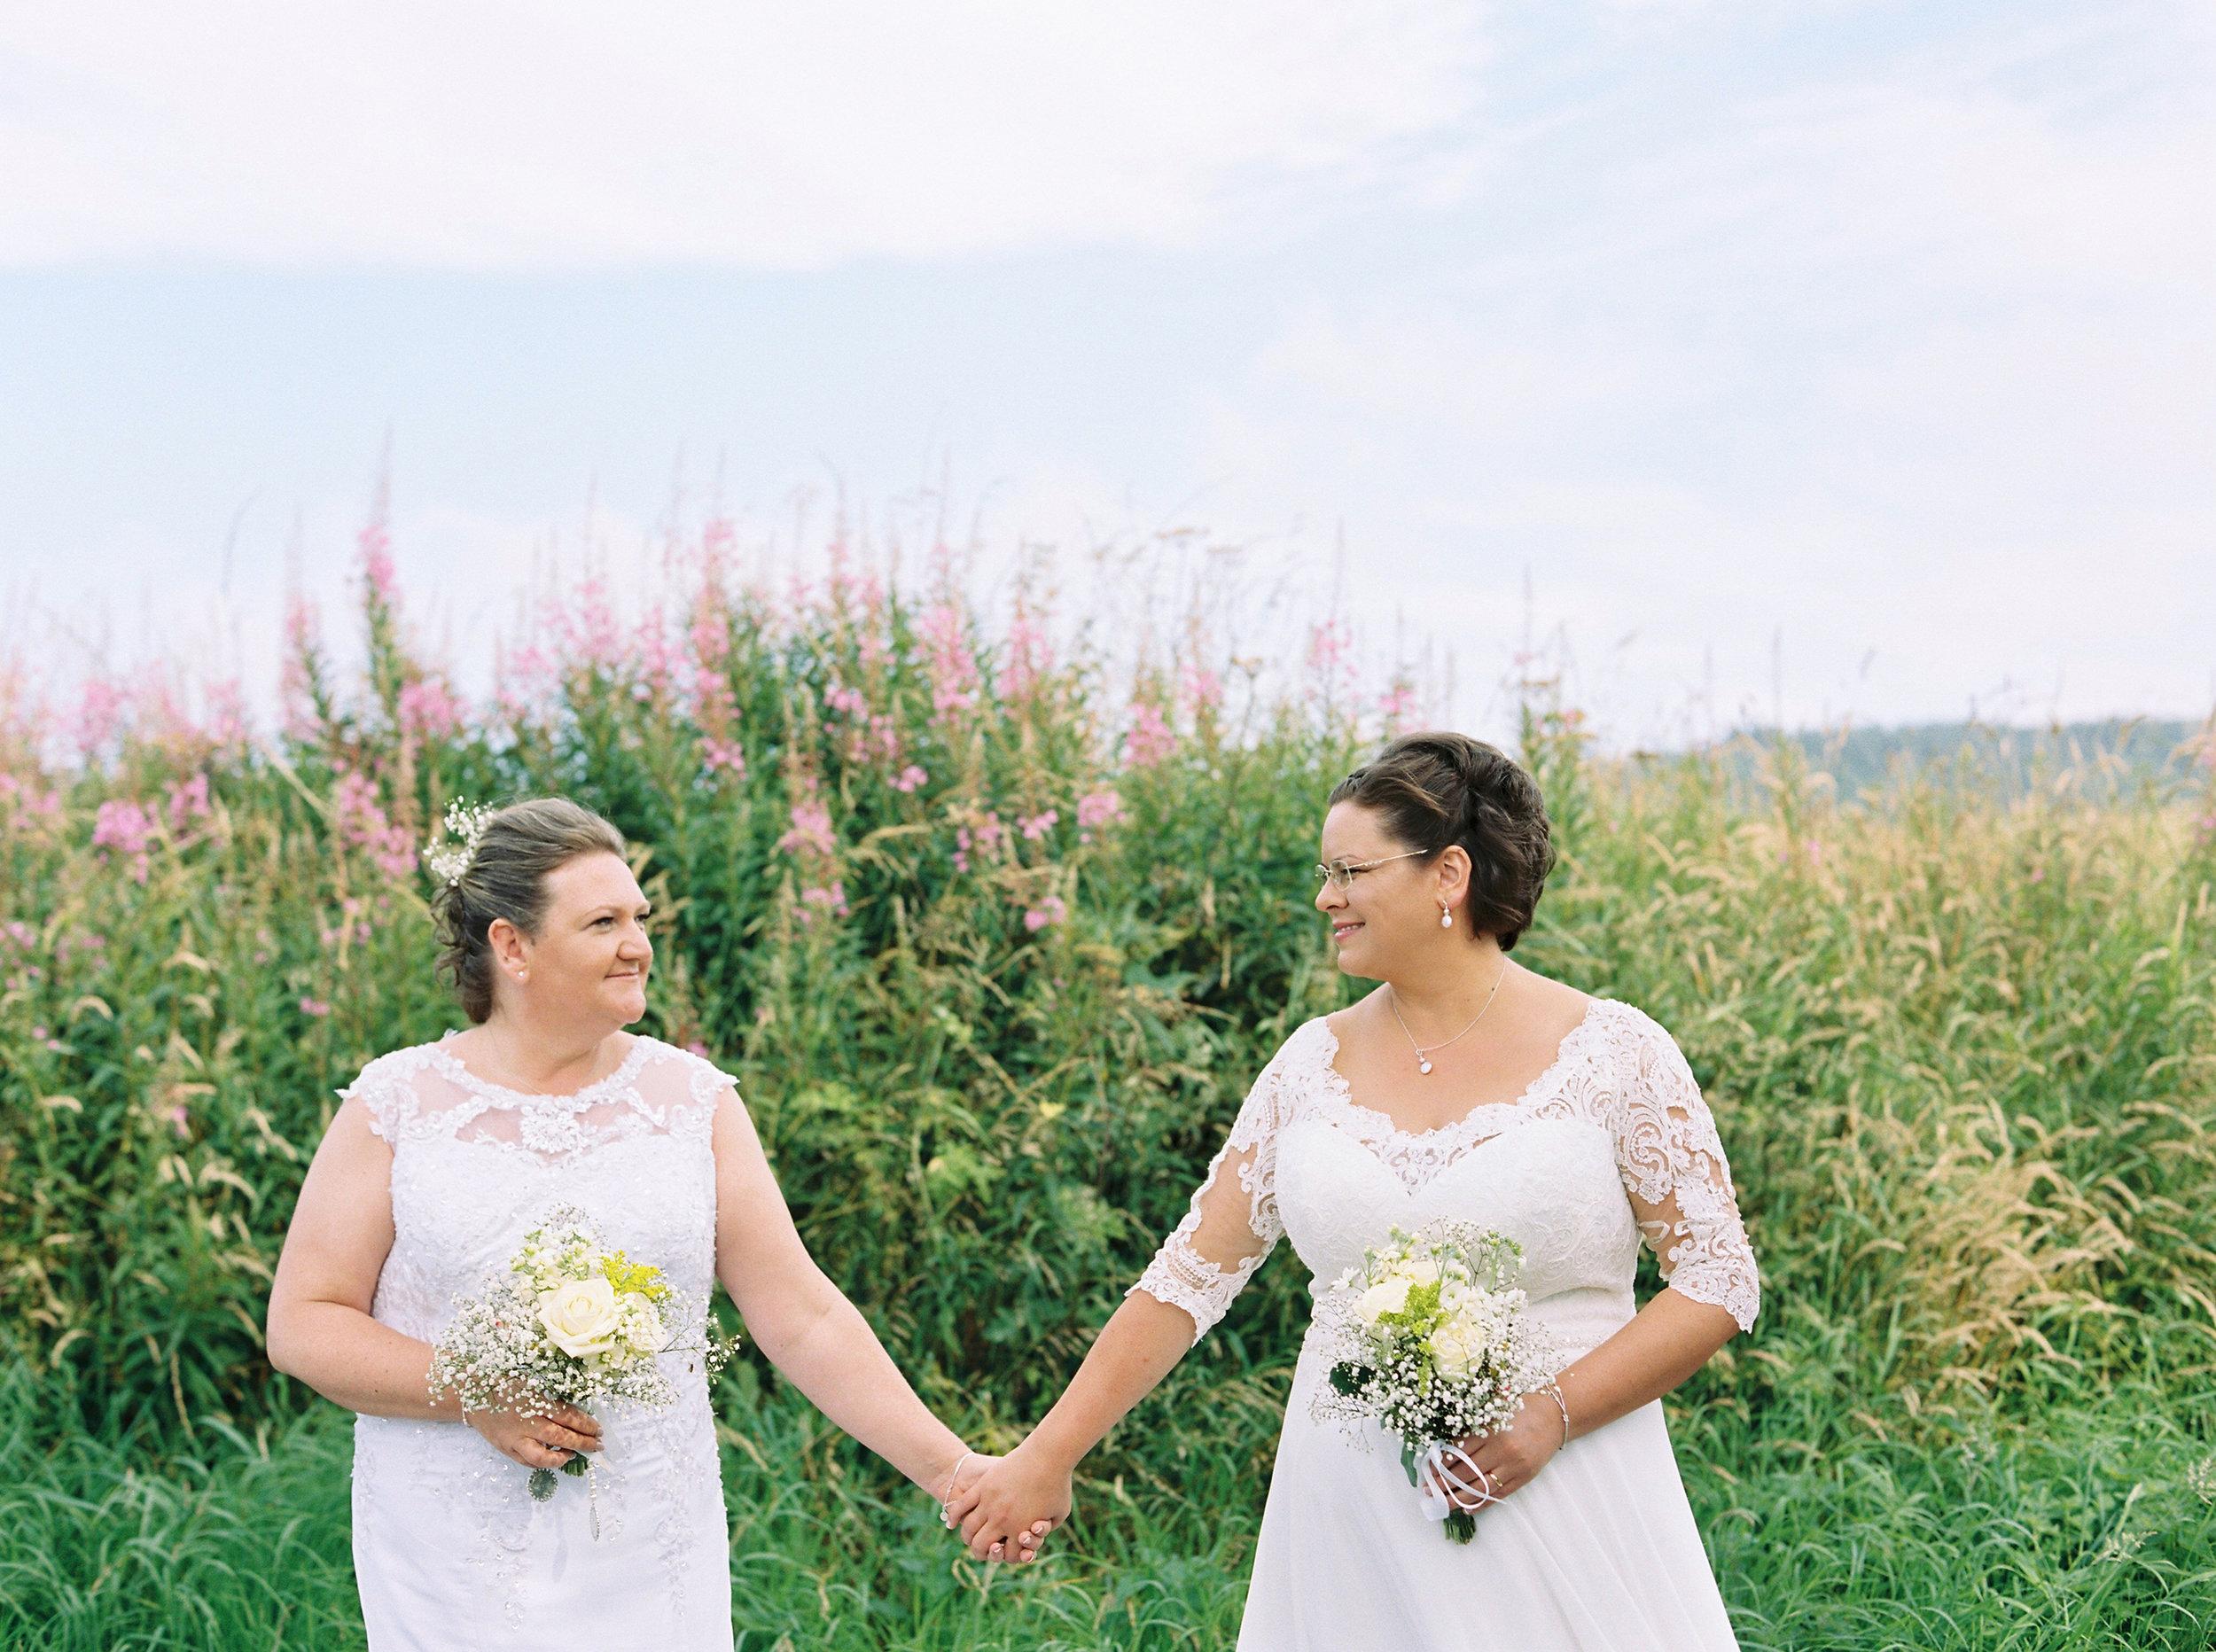 wedding-photography-scotland257.jpg